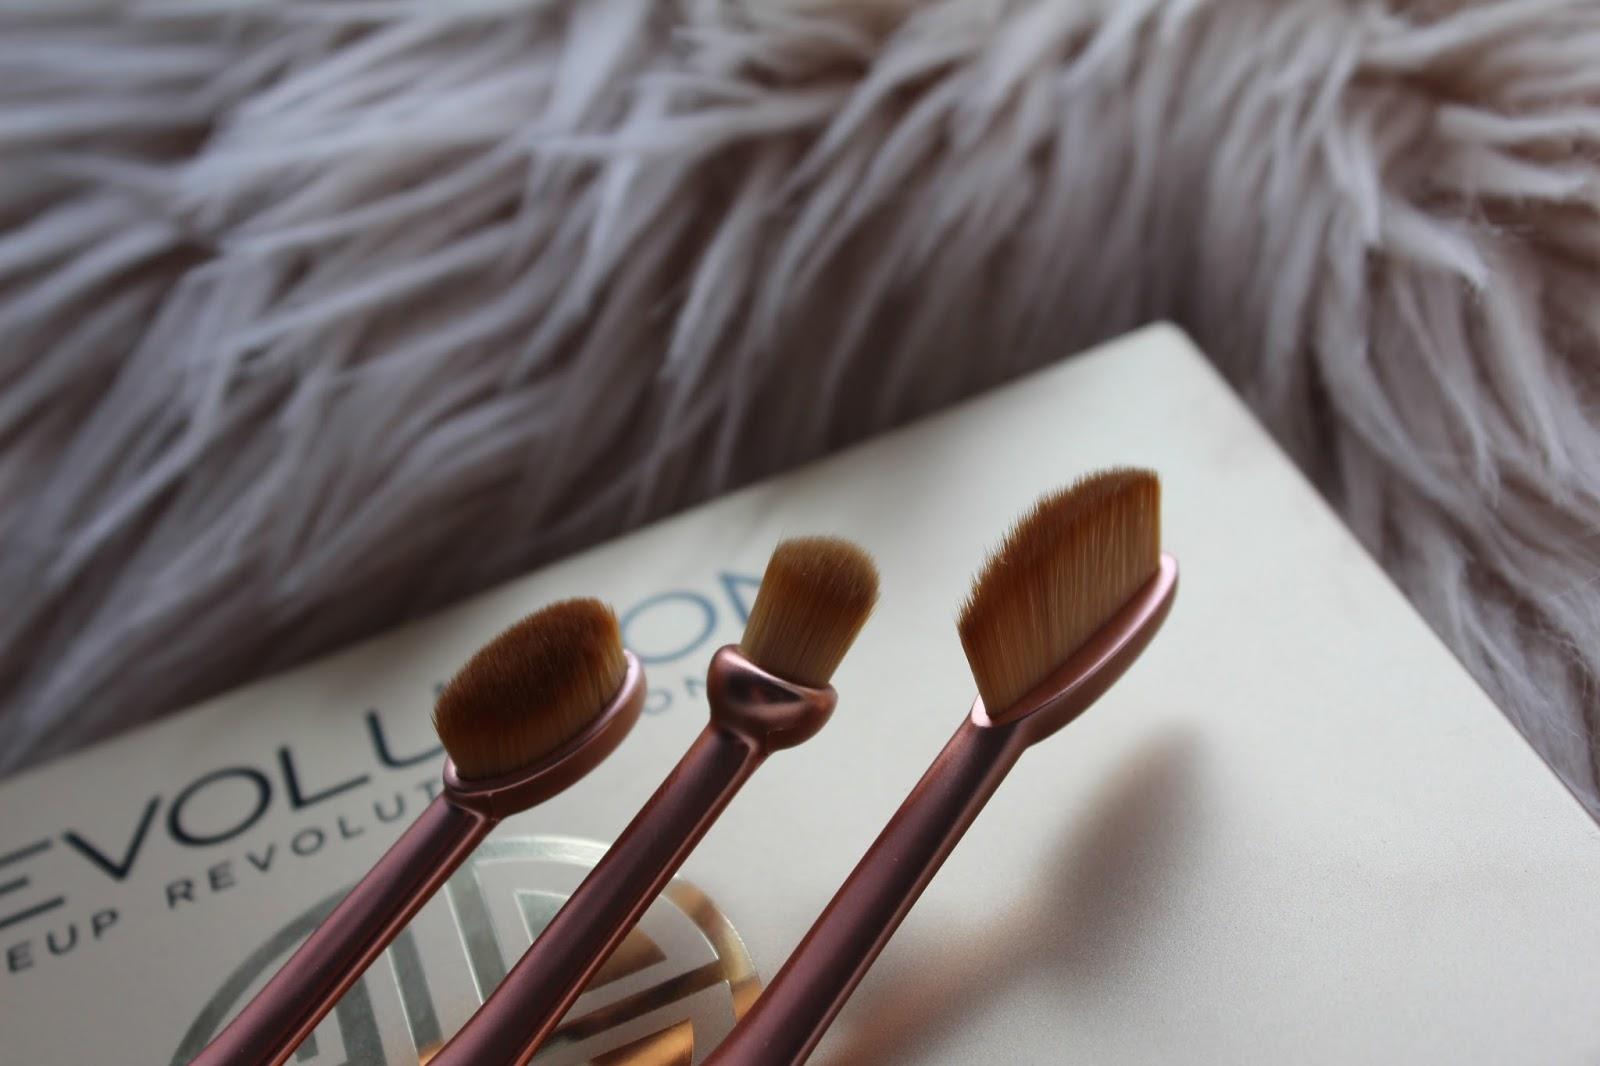 revolution_london_makeup_brushes